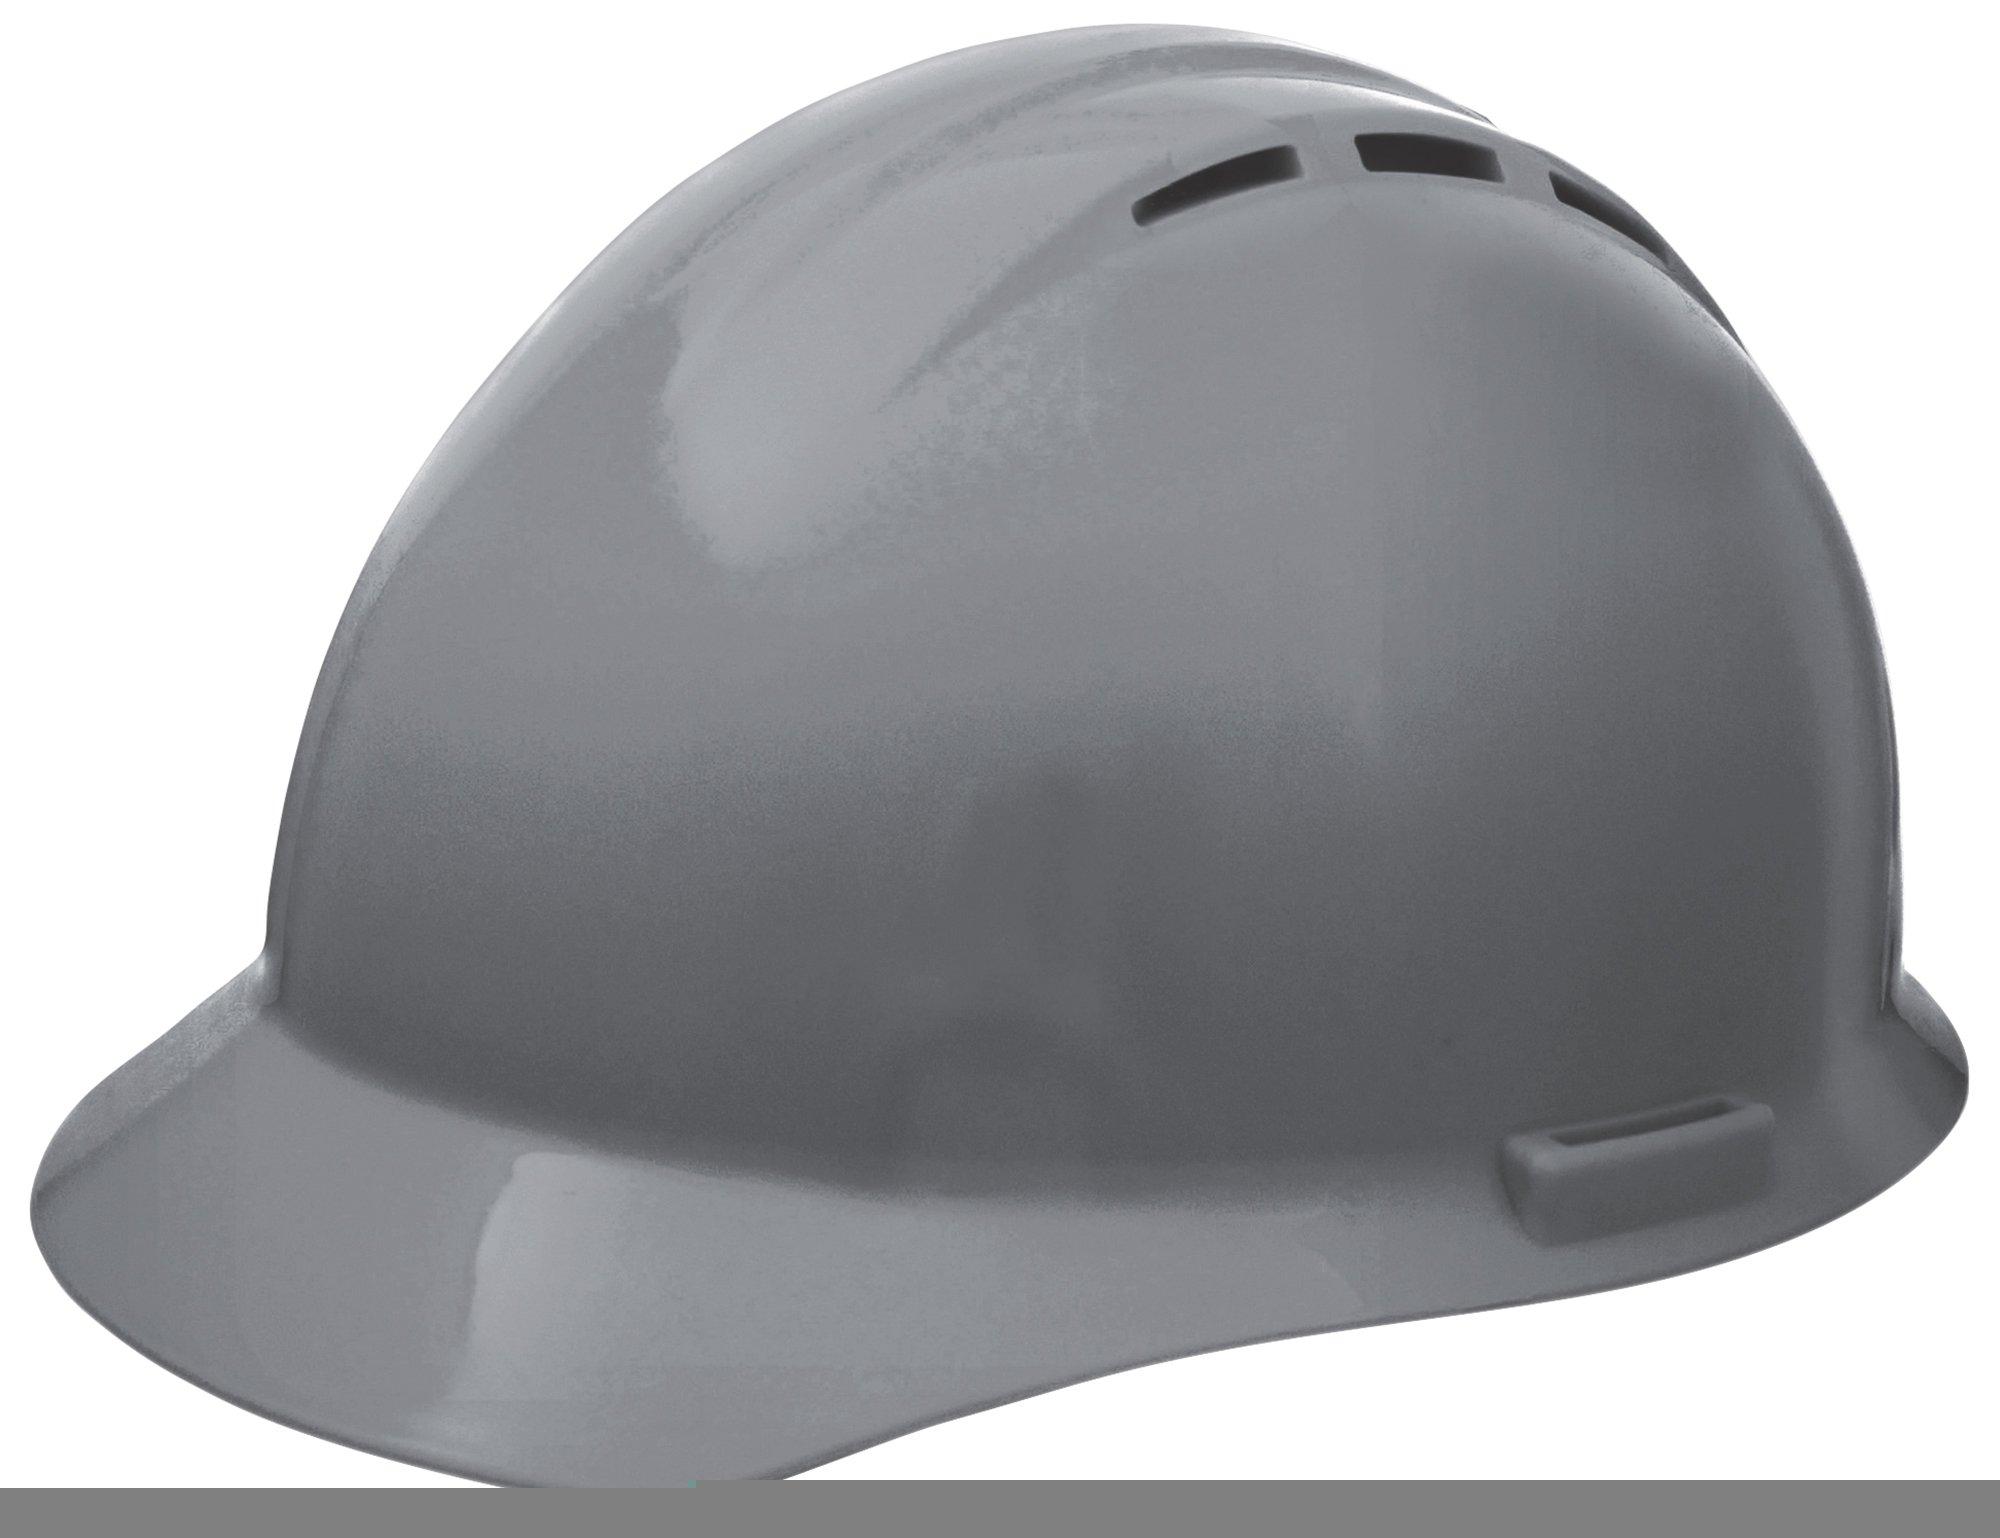 ERB Safety Products 19457 Americana Vent Mega Ratchet, Size: 6 1/2 - 8, Gray